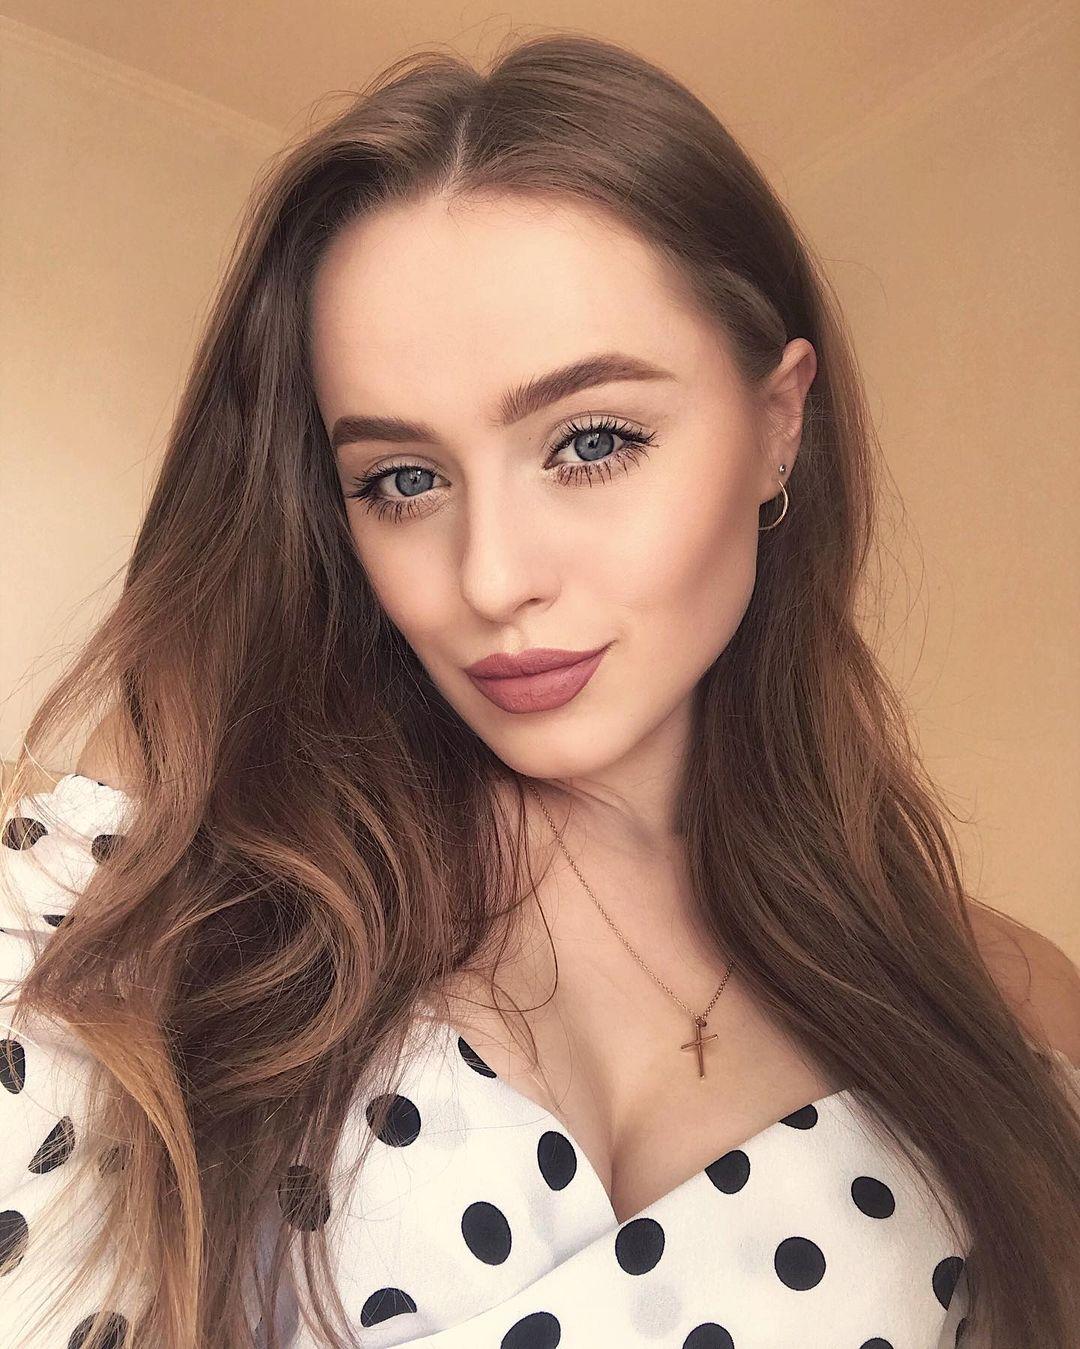 Charming ukraine girl